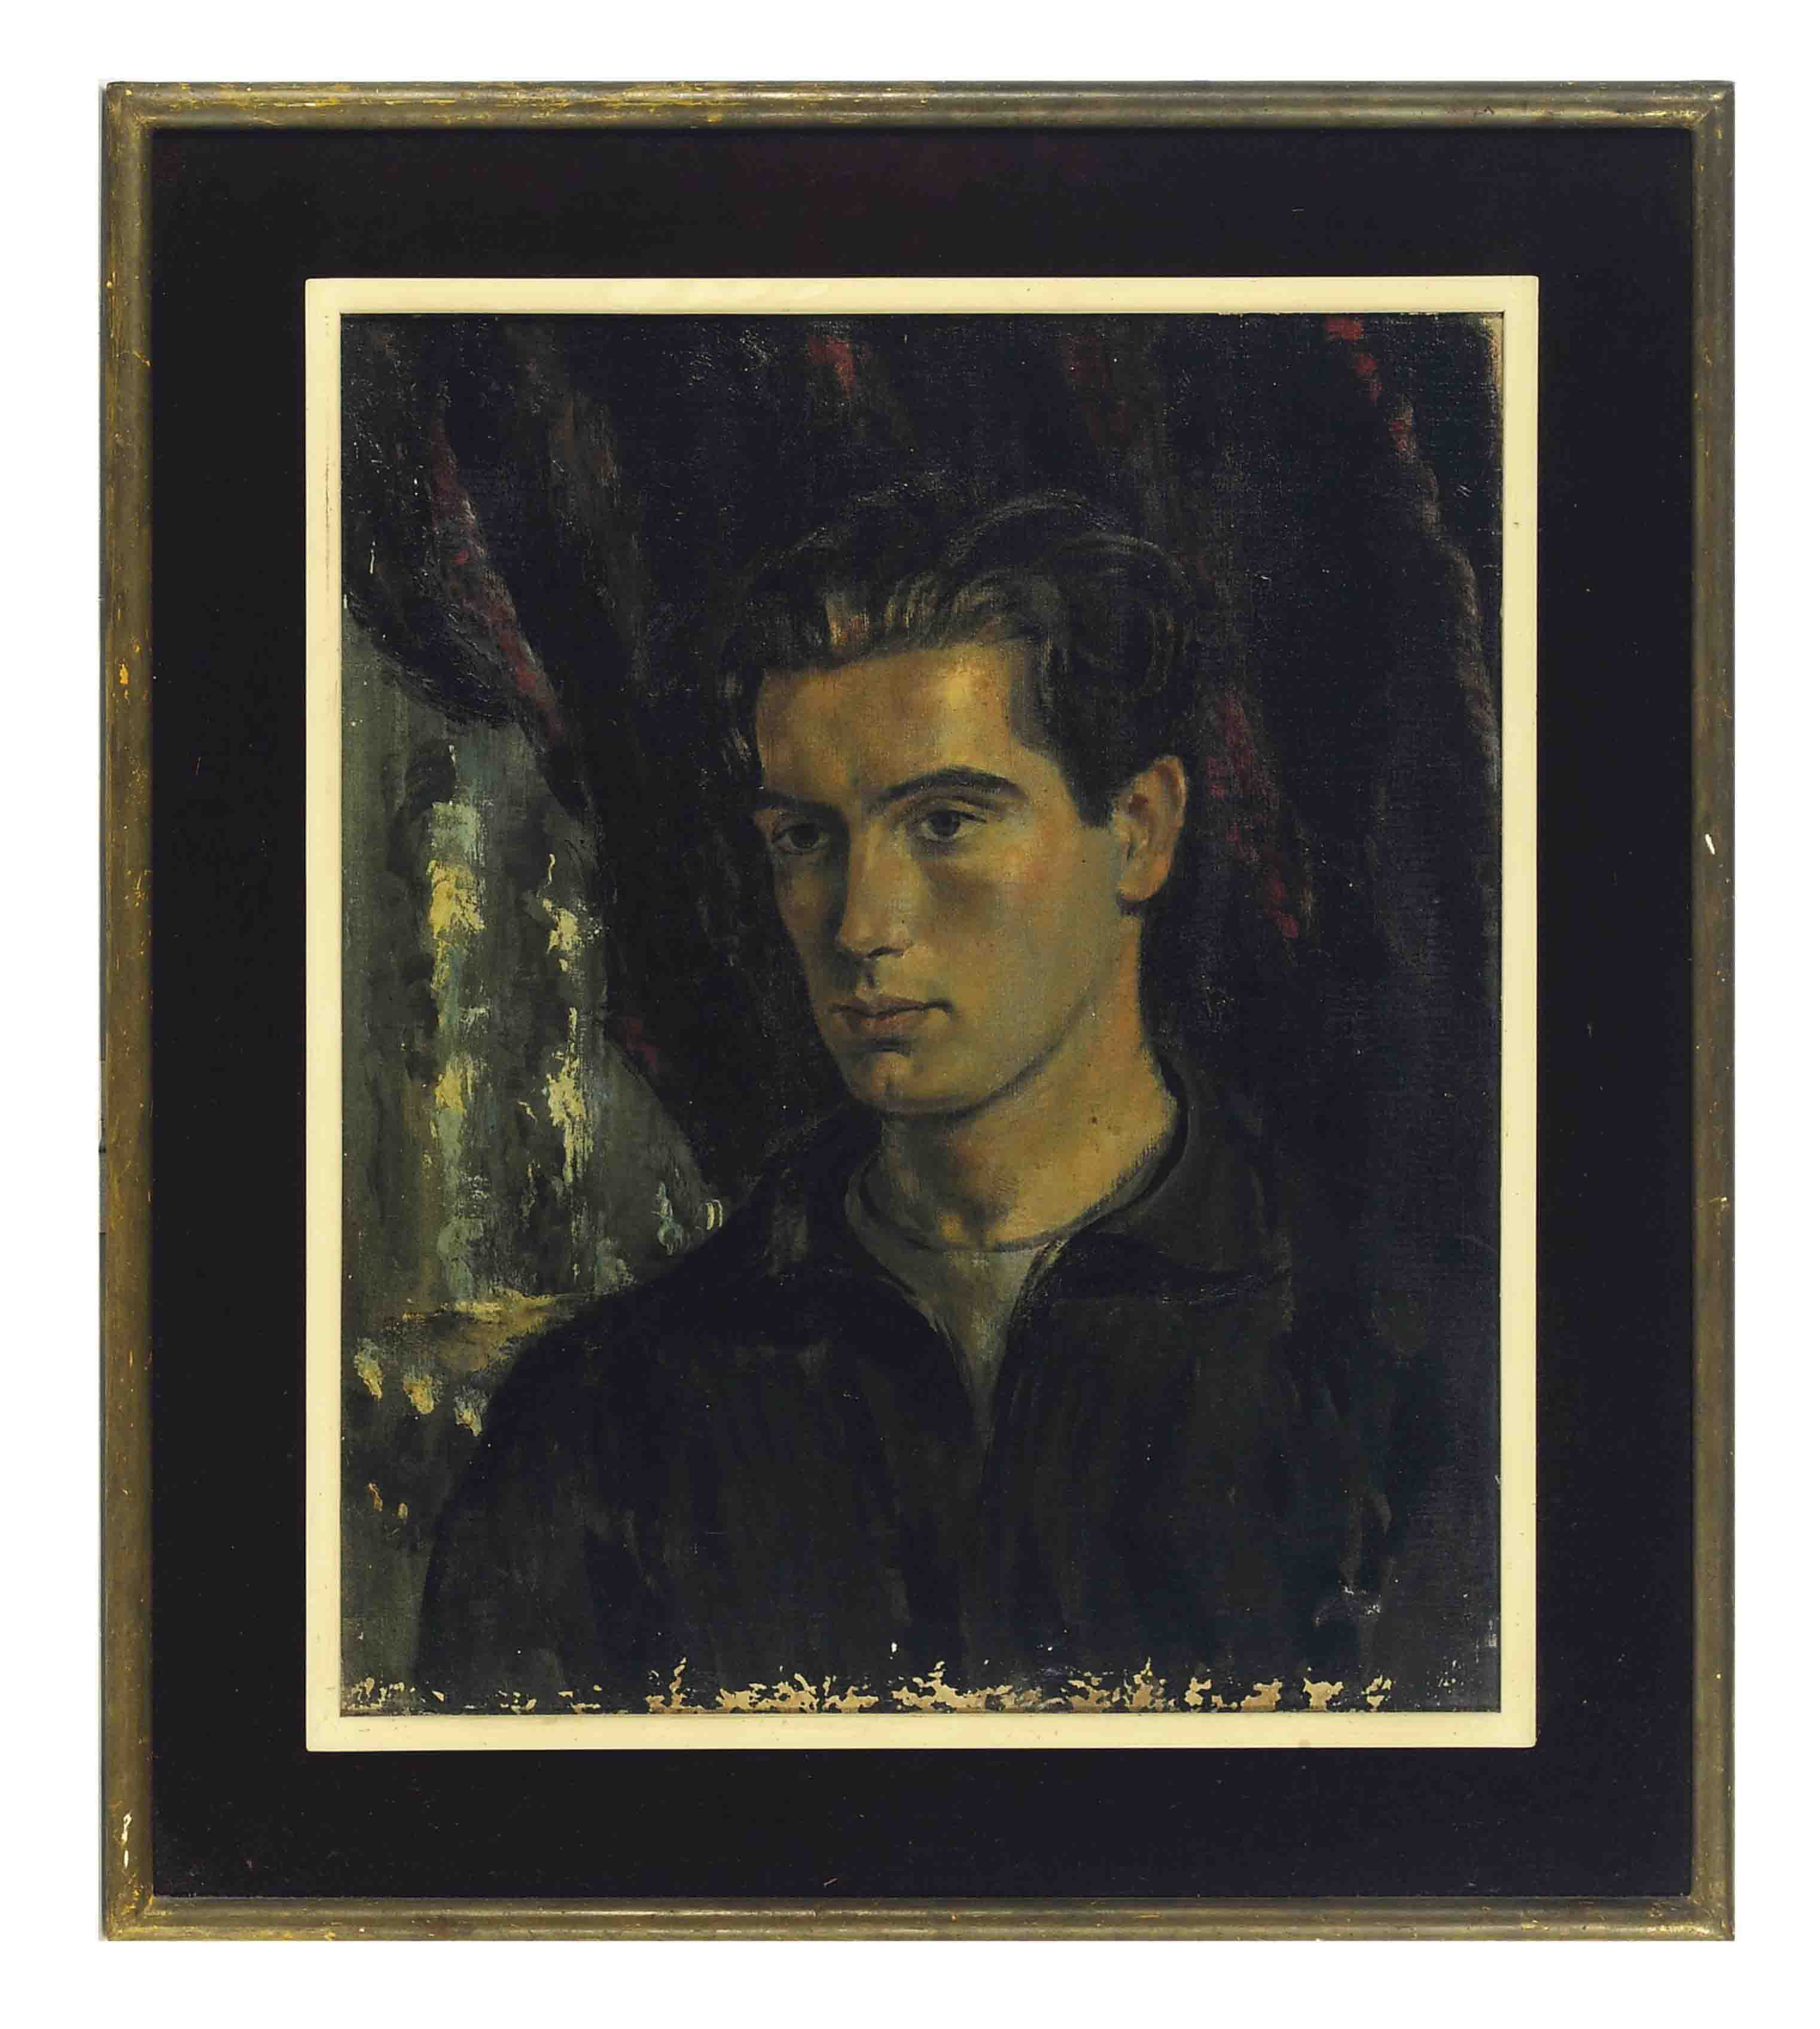 Portrait of Peter Glenville (1913-1996)